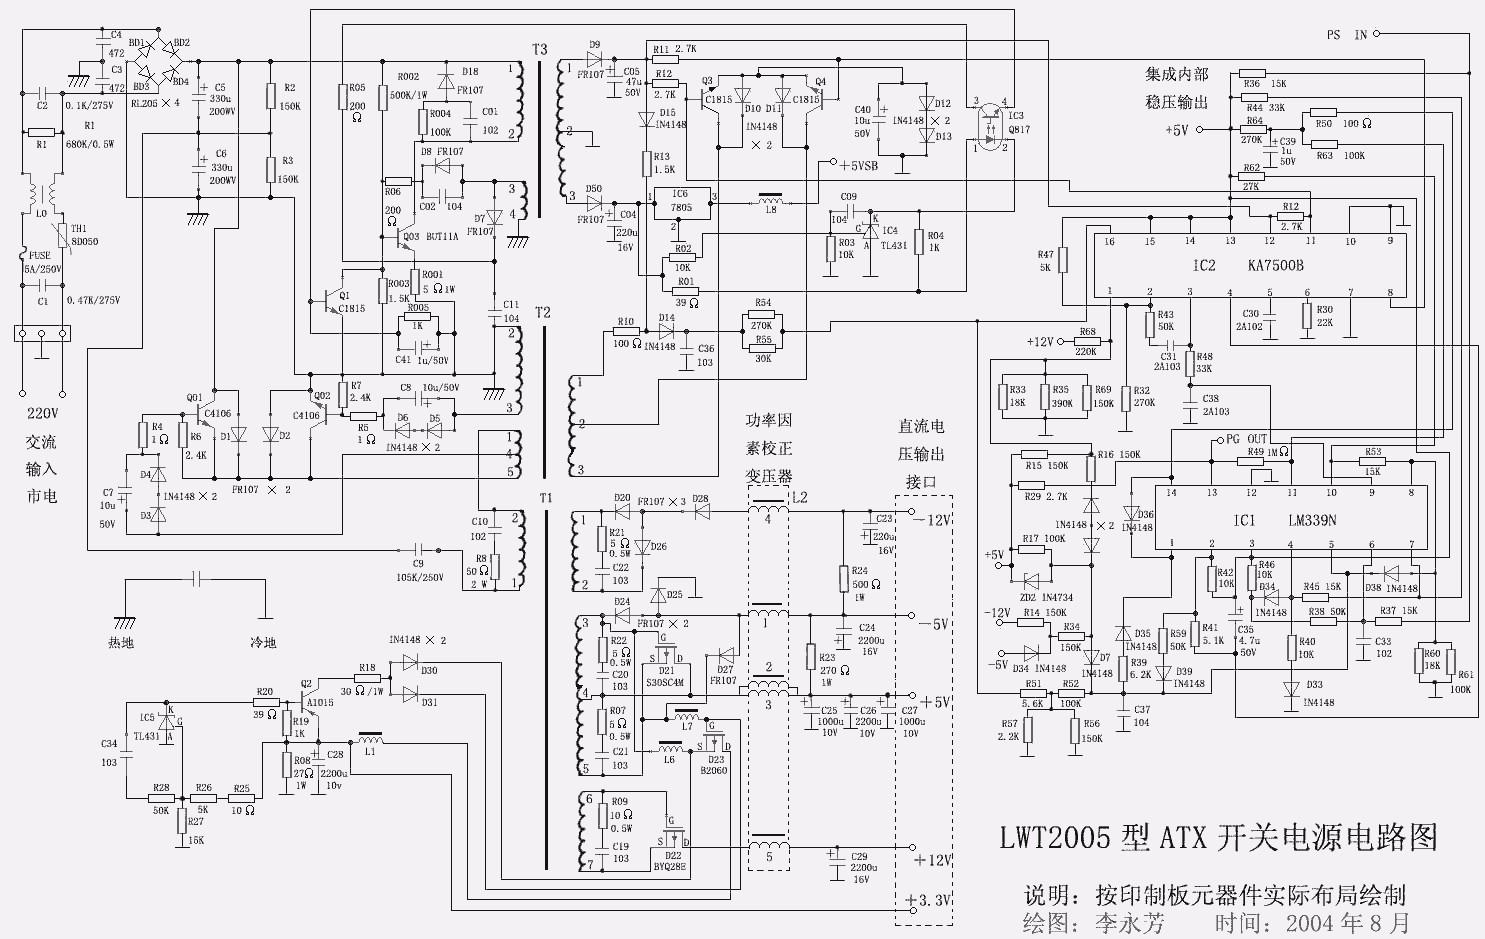 ATX LWT2005 china KA7500B